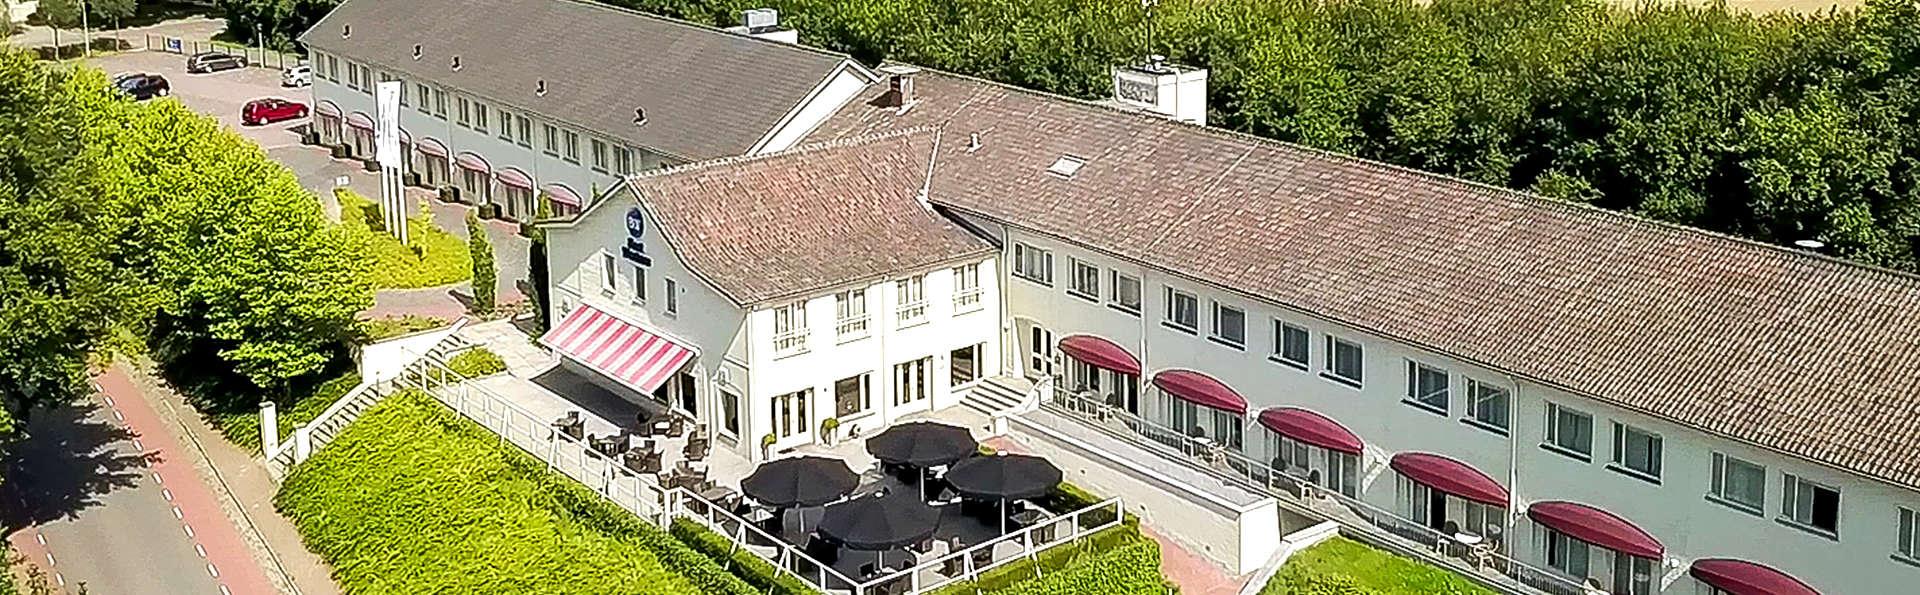 Best Western Hotel Slenaken - EDIT_NEW2_FRONT.jpg